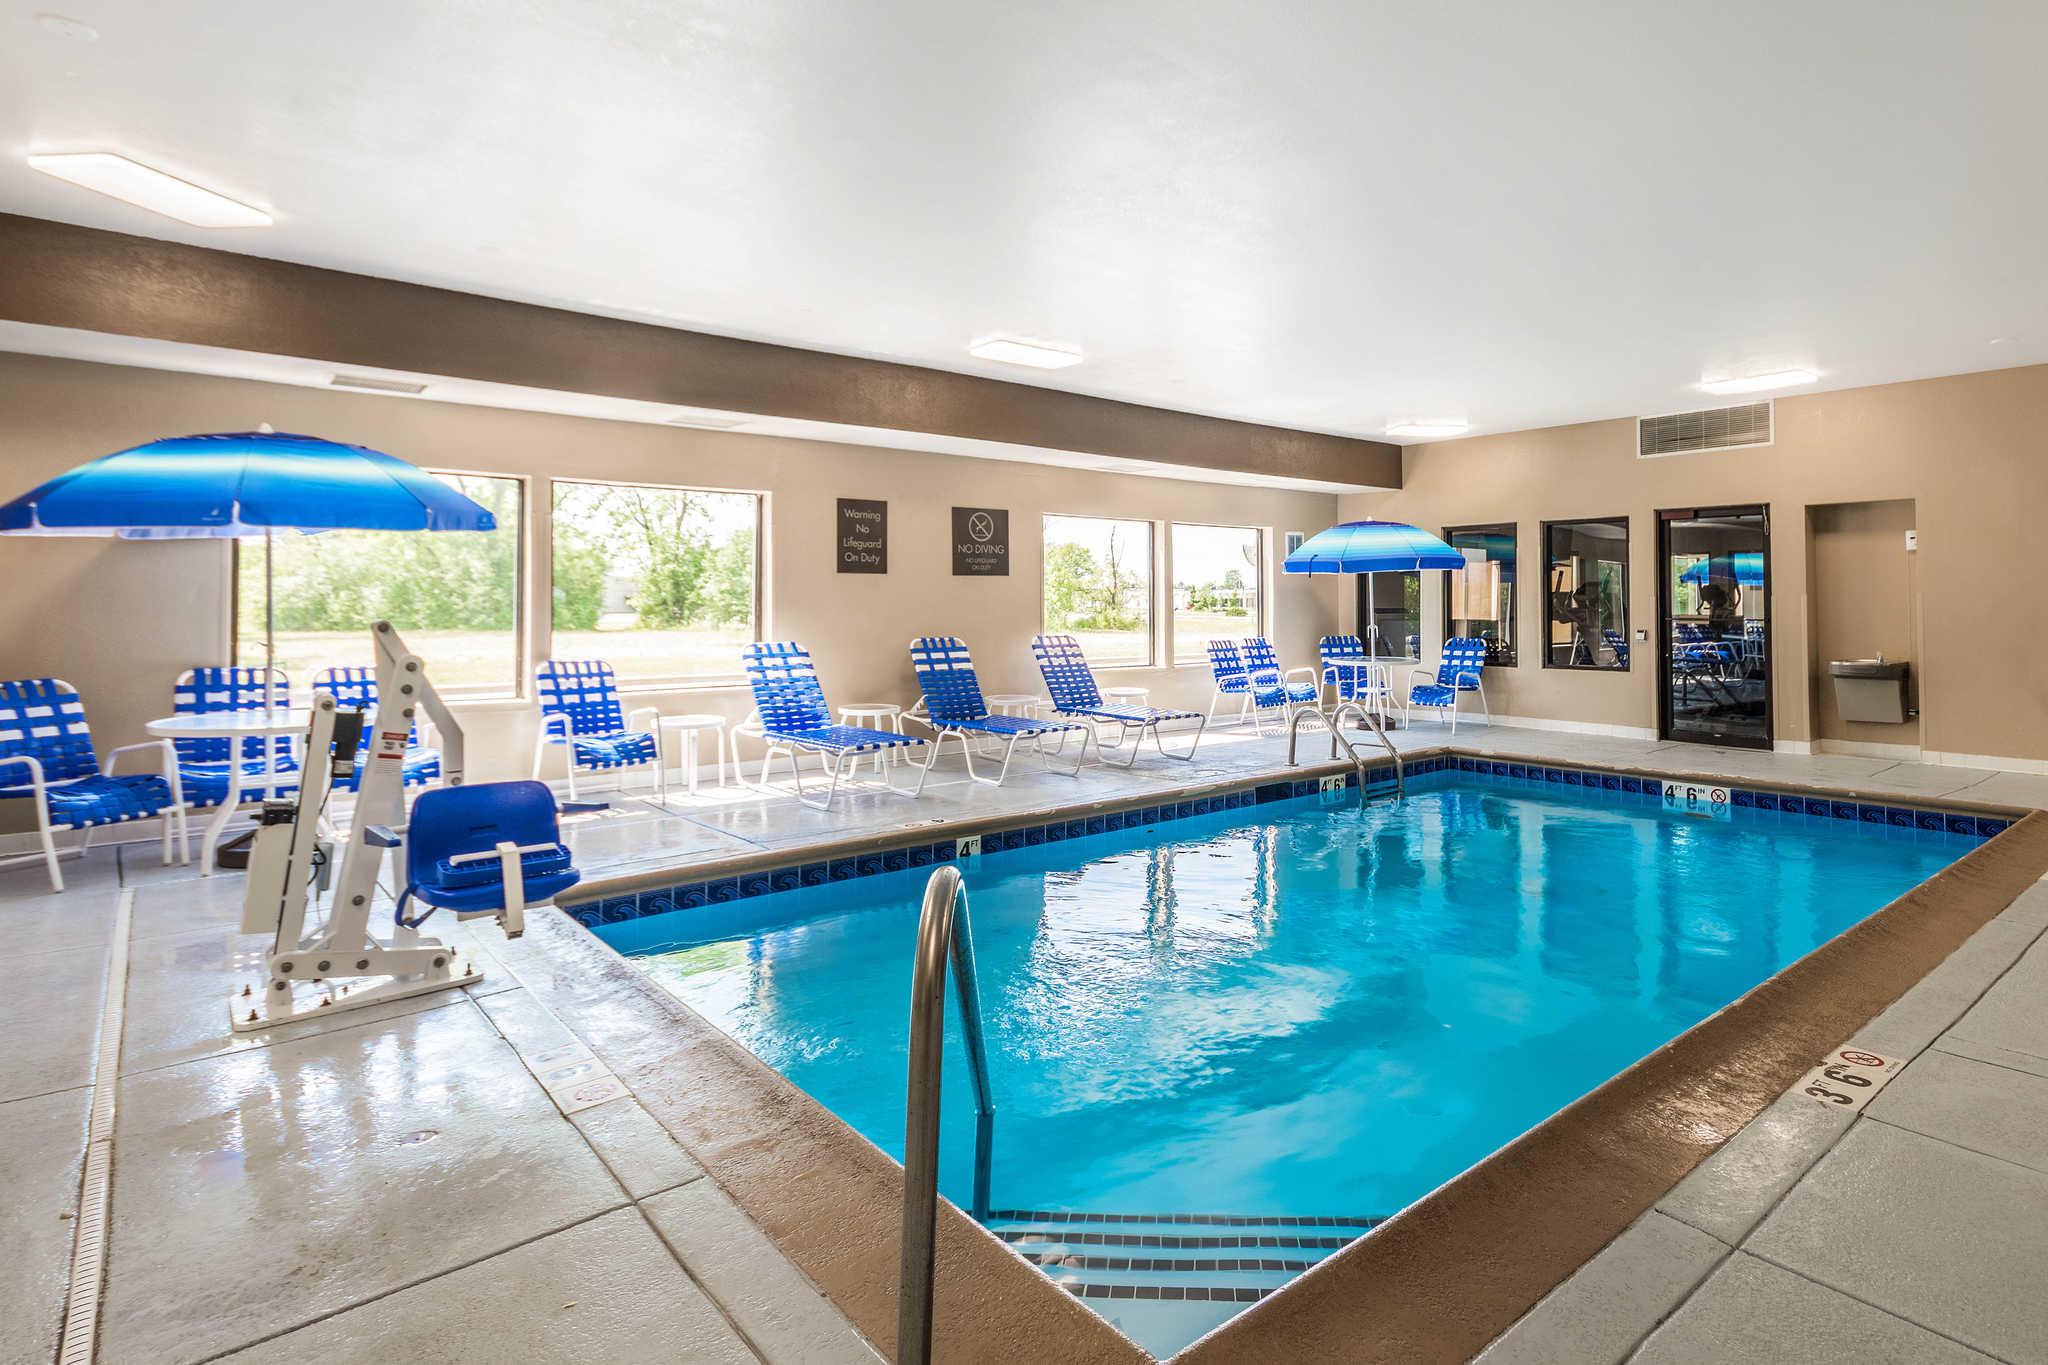 Comfort Inn & Suites North Aurora - Naperville image 34